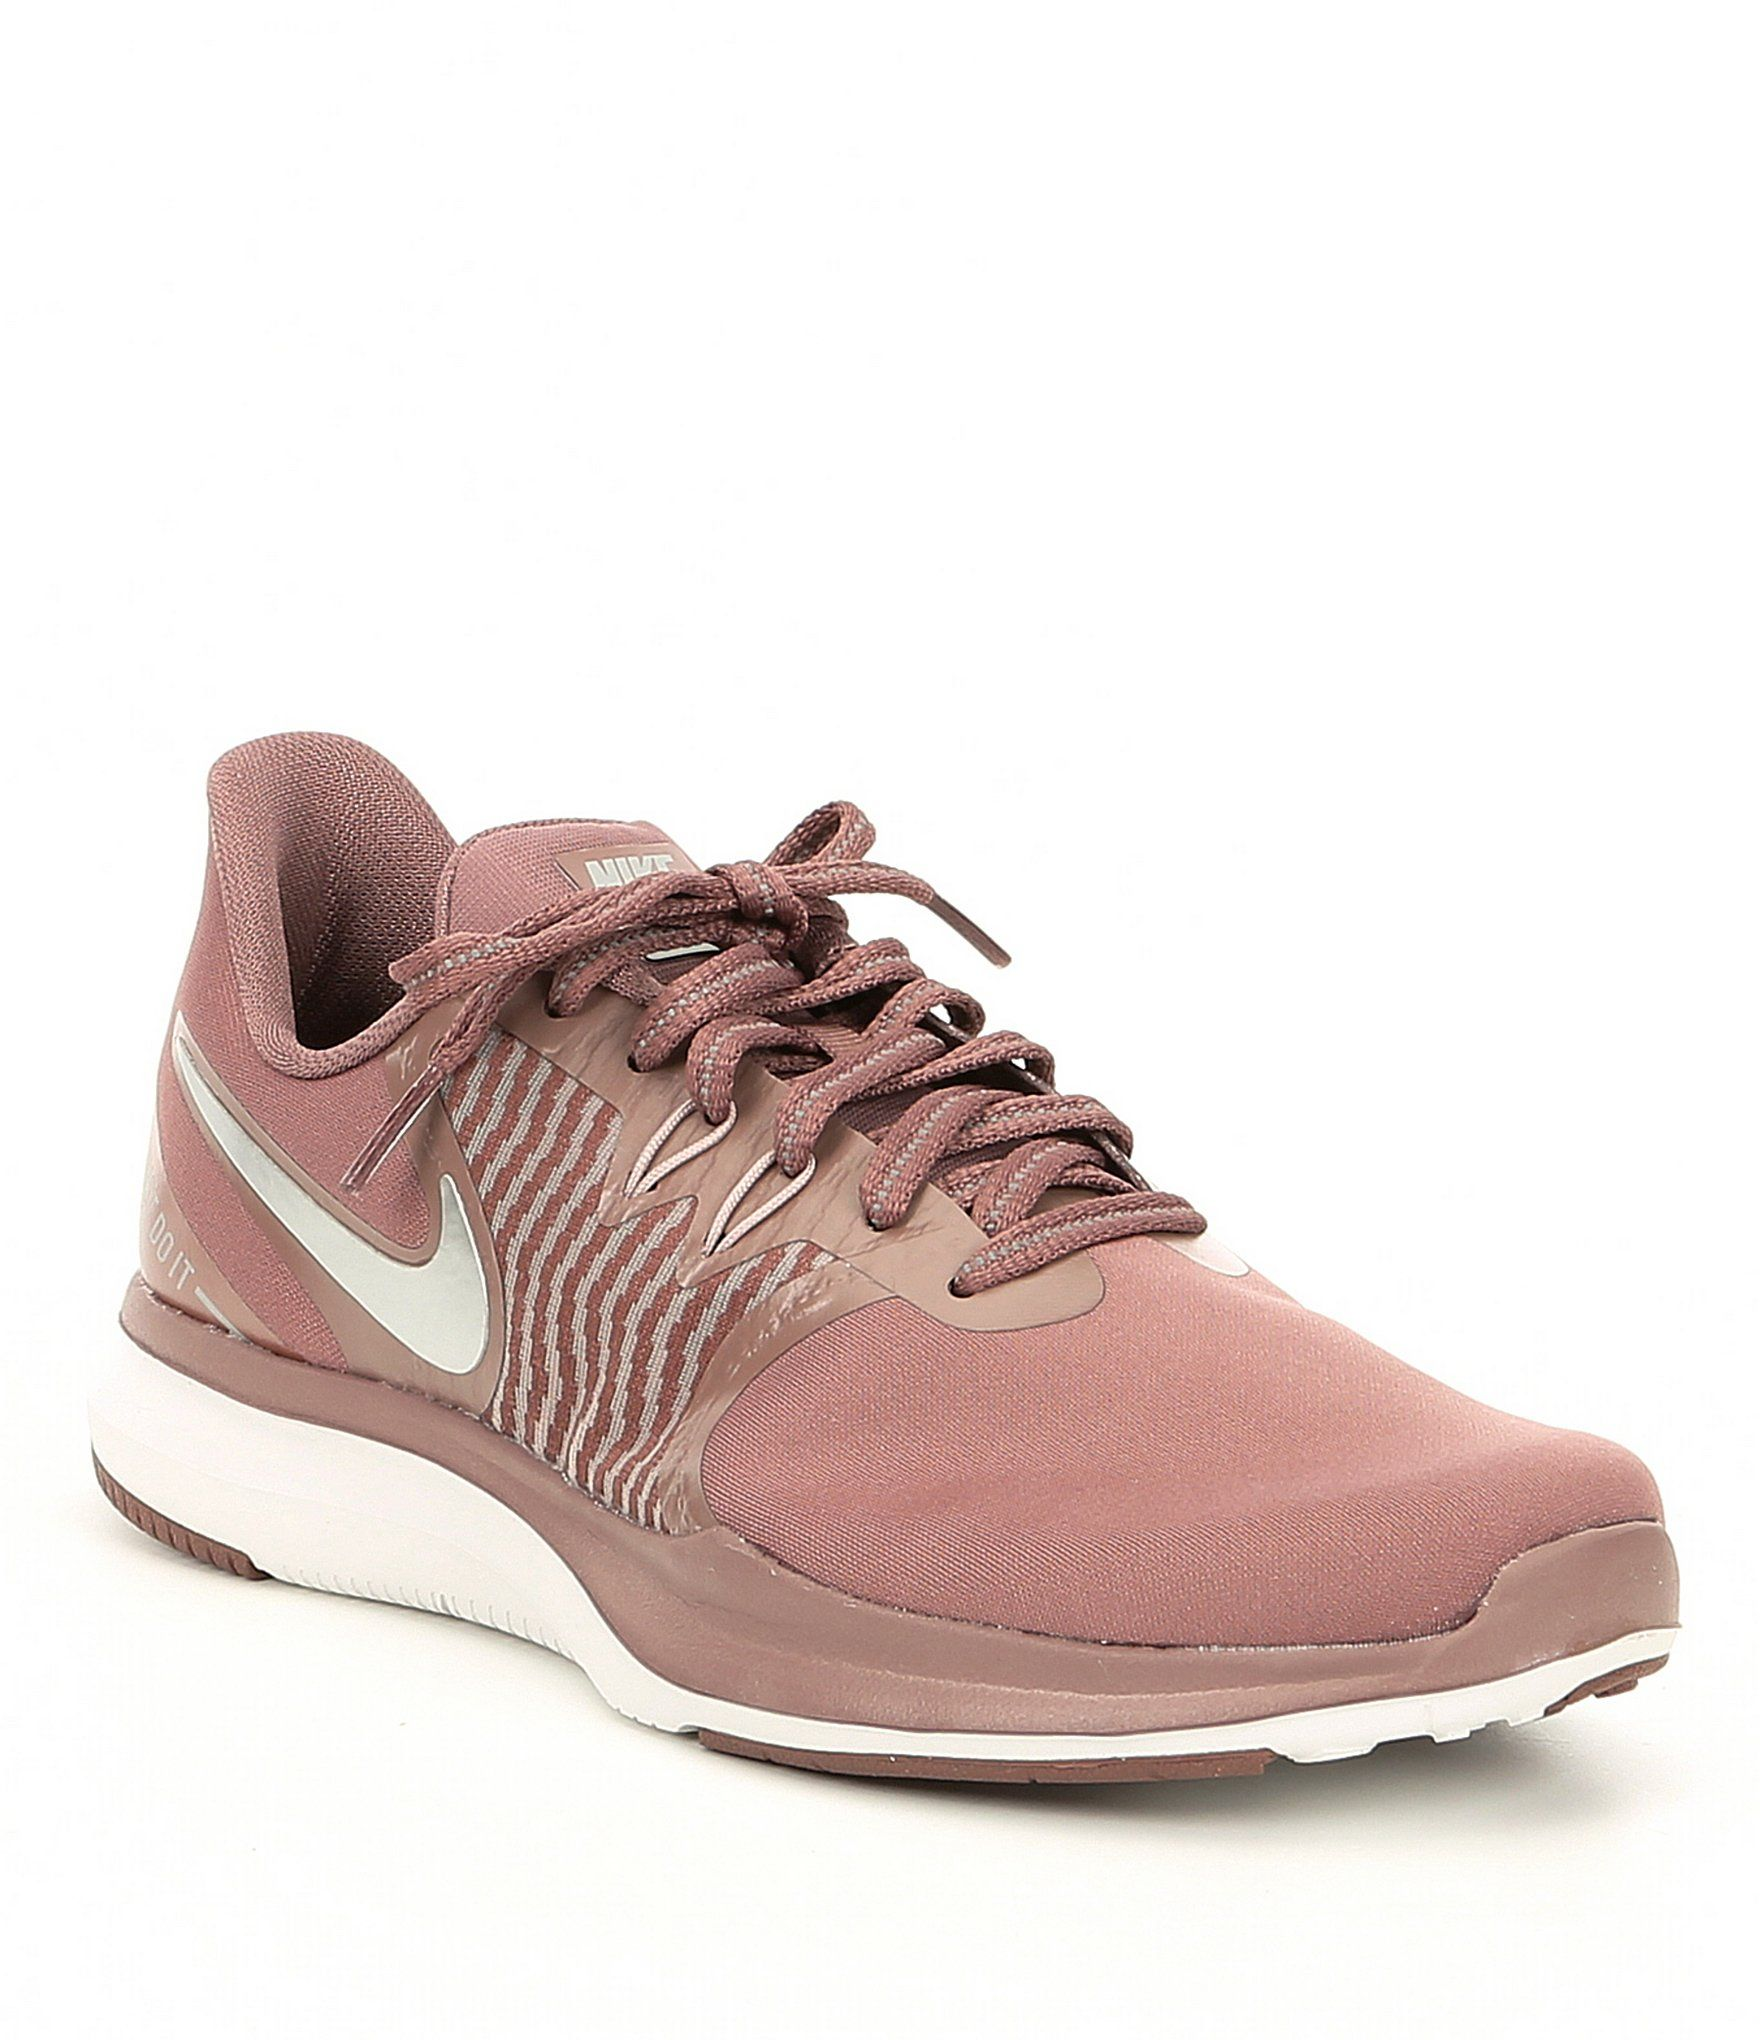 online store 2c156 be1a9 Nike Women s In-Season TR 8 Premium Training Shoe  Dillards